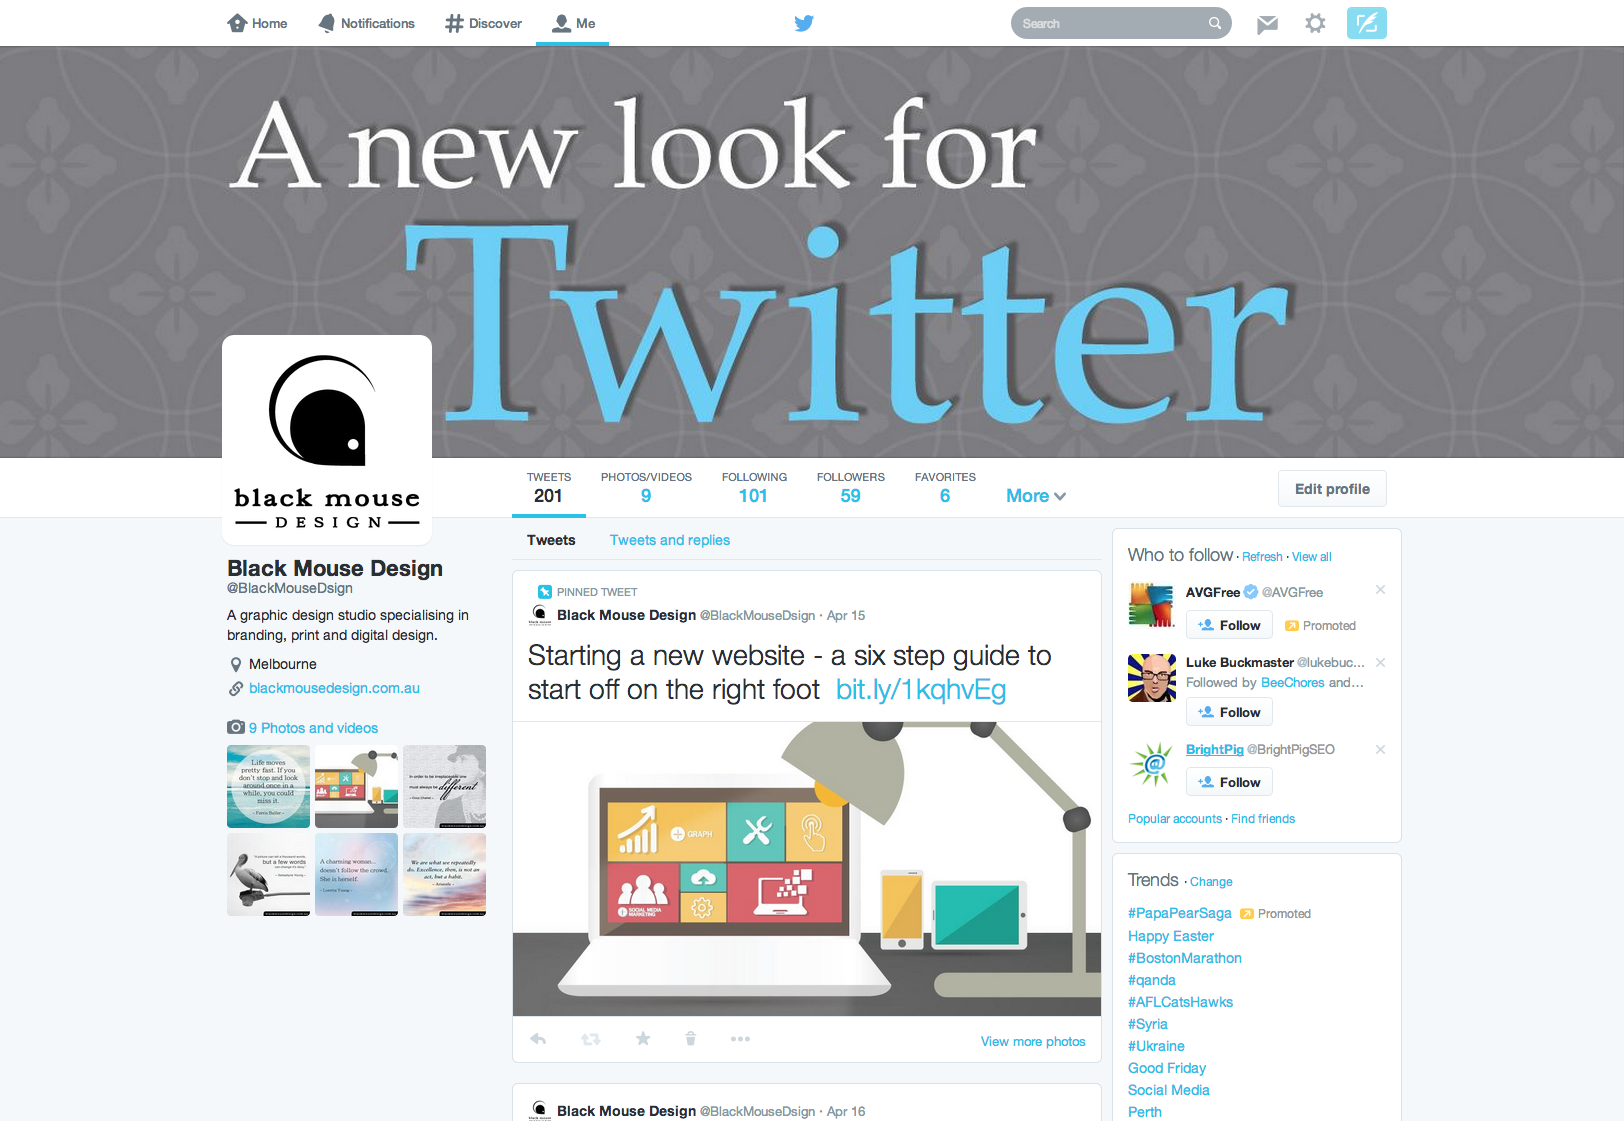 new_twitter_2014